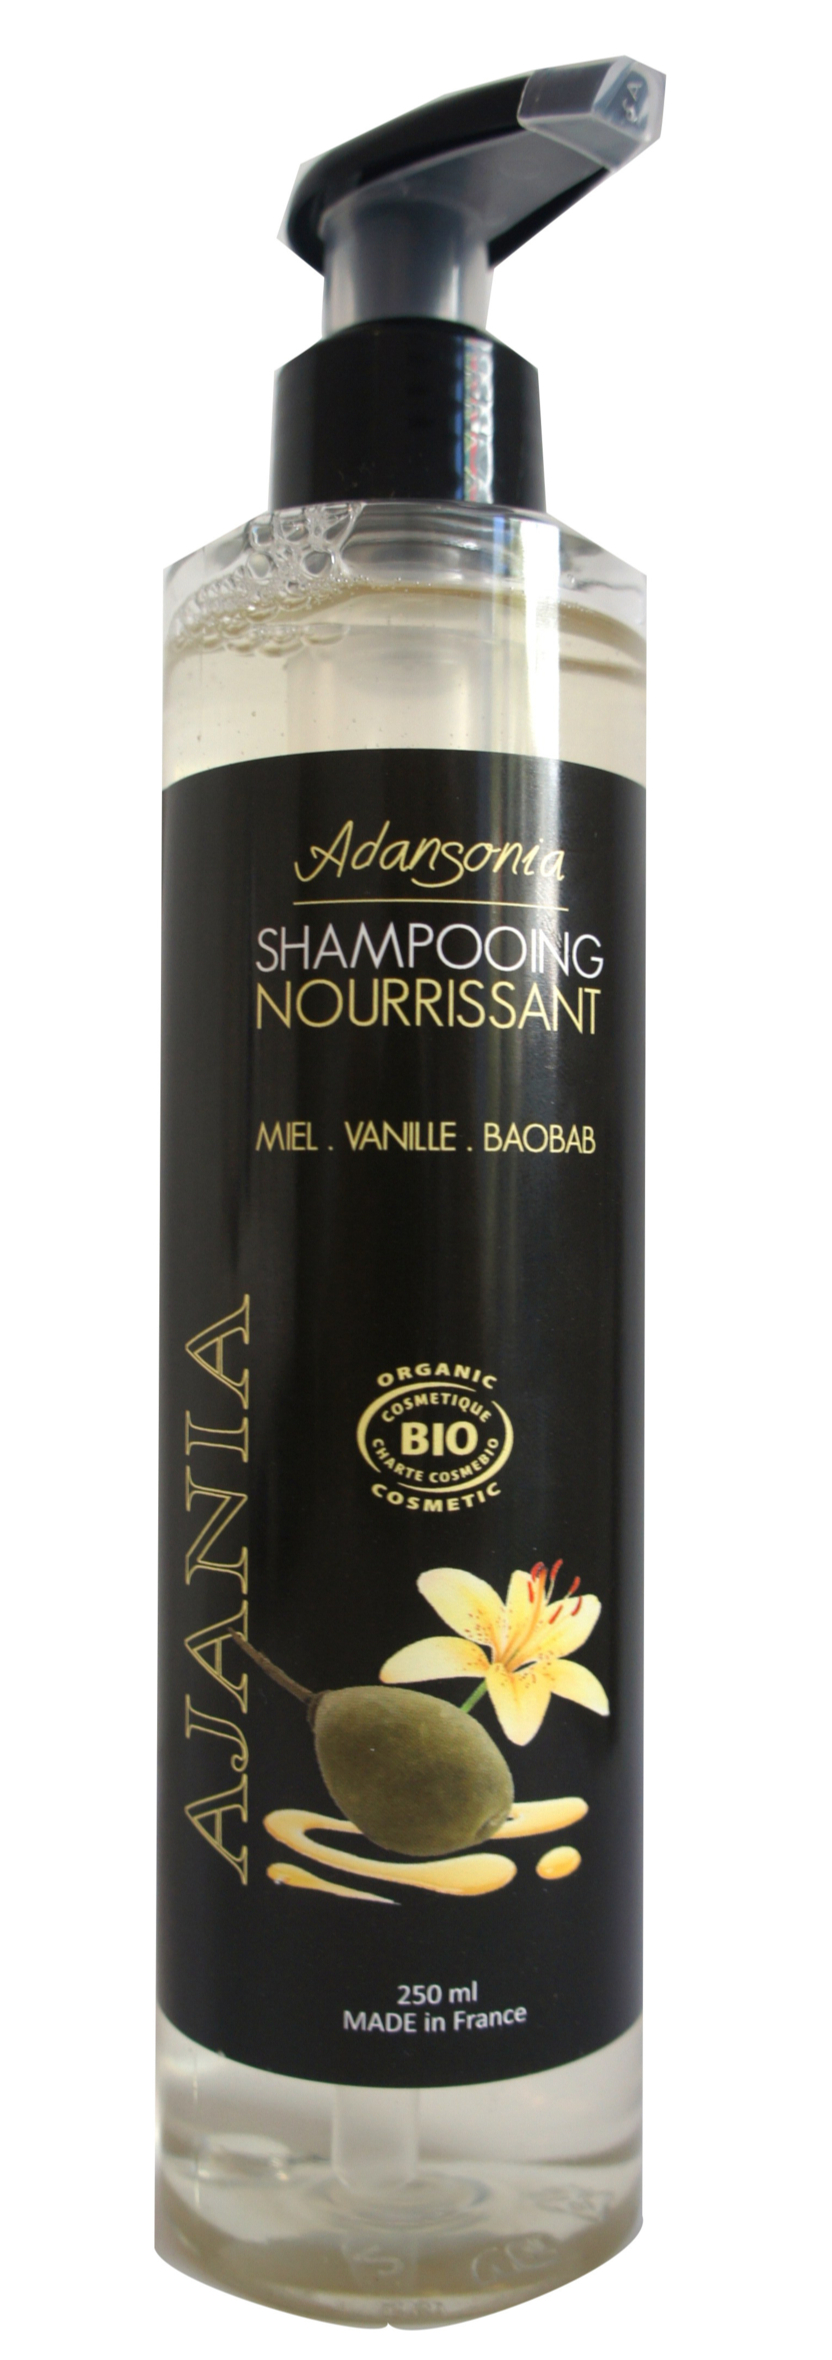 Ajania Adansonia- Shampooing Bio Nourrissant - 250 ml - Baobab Extrême souplesse